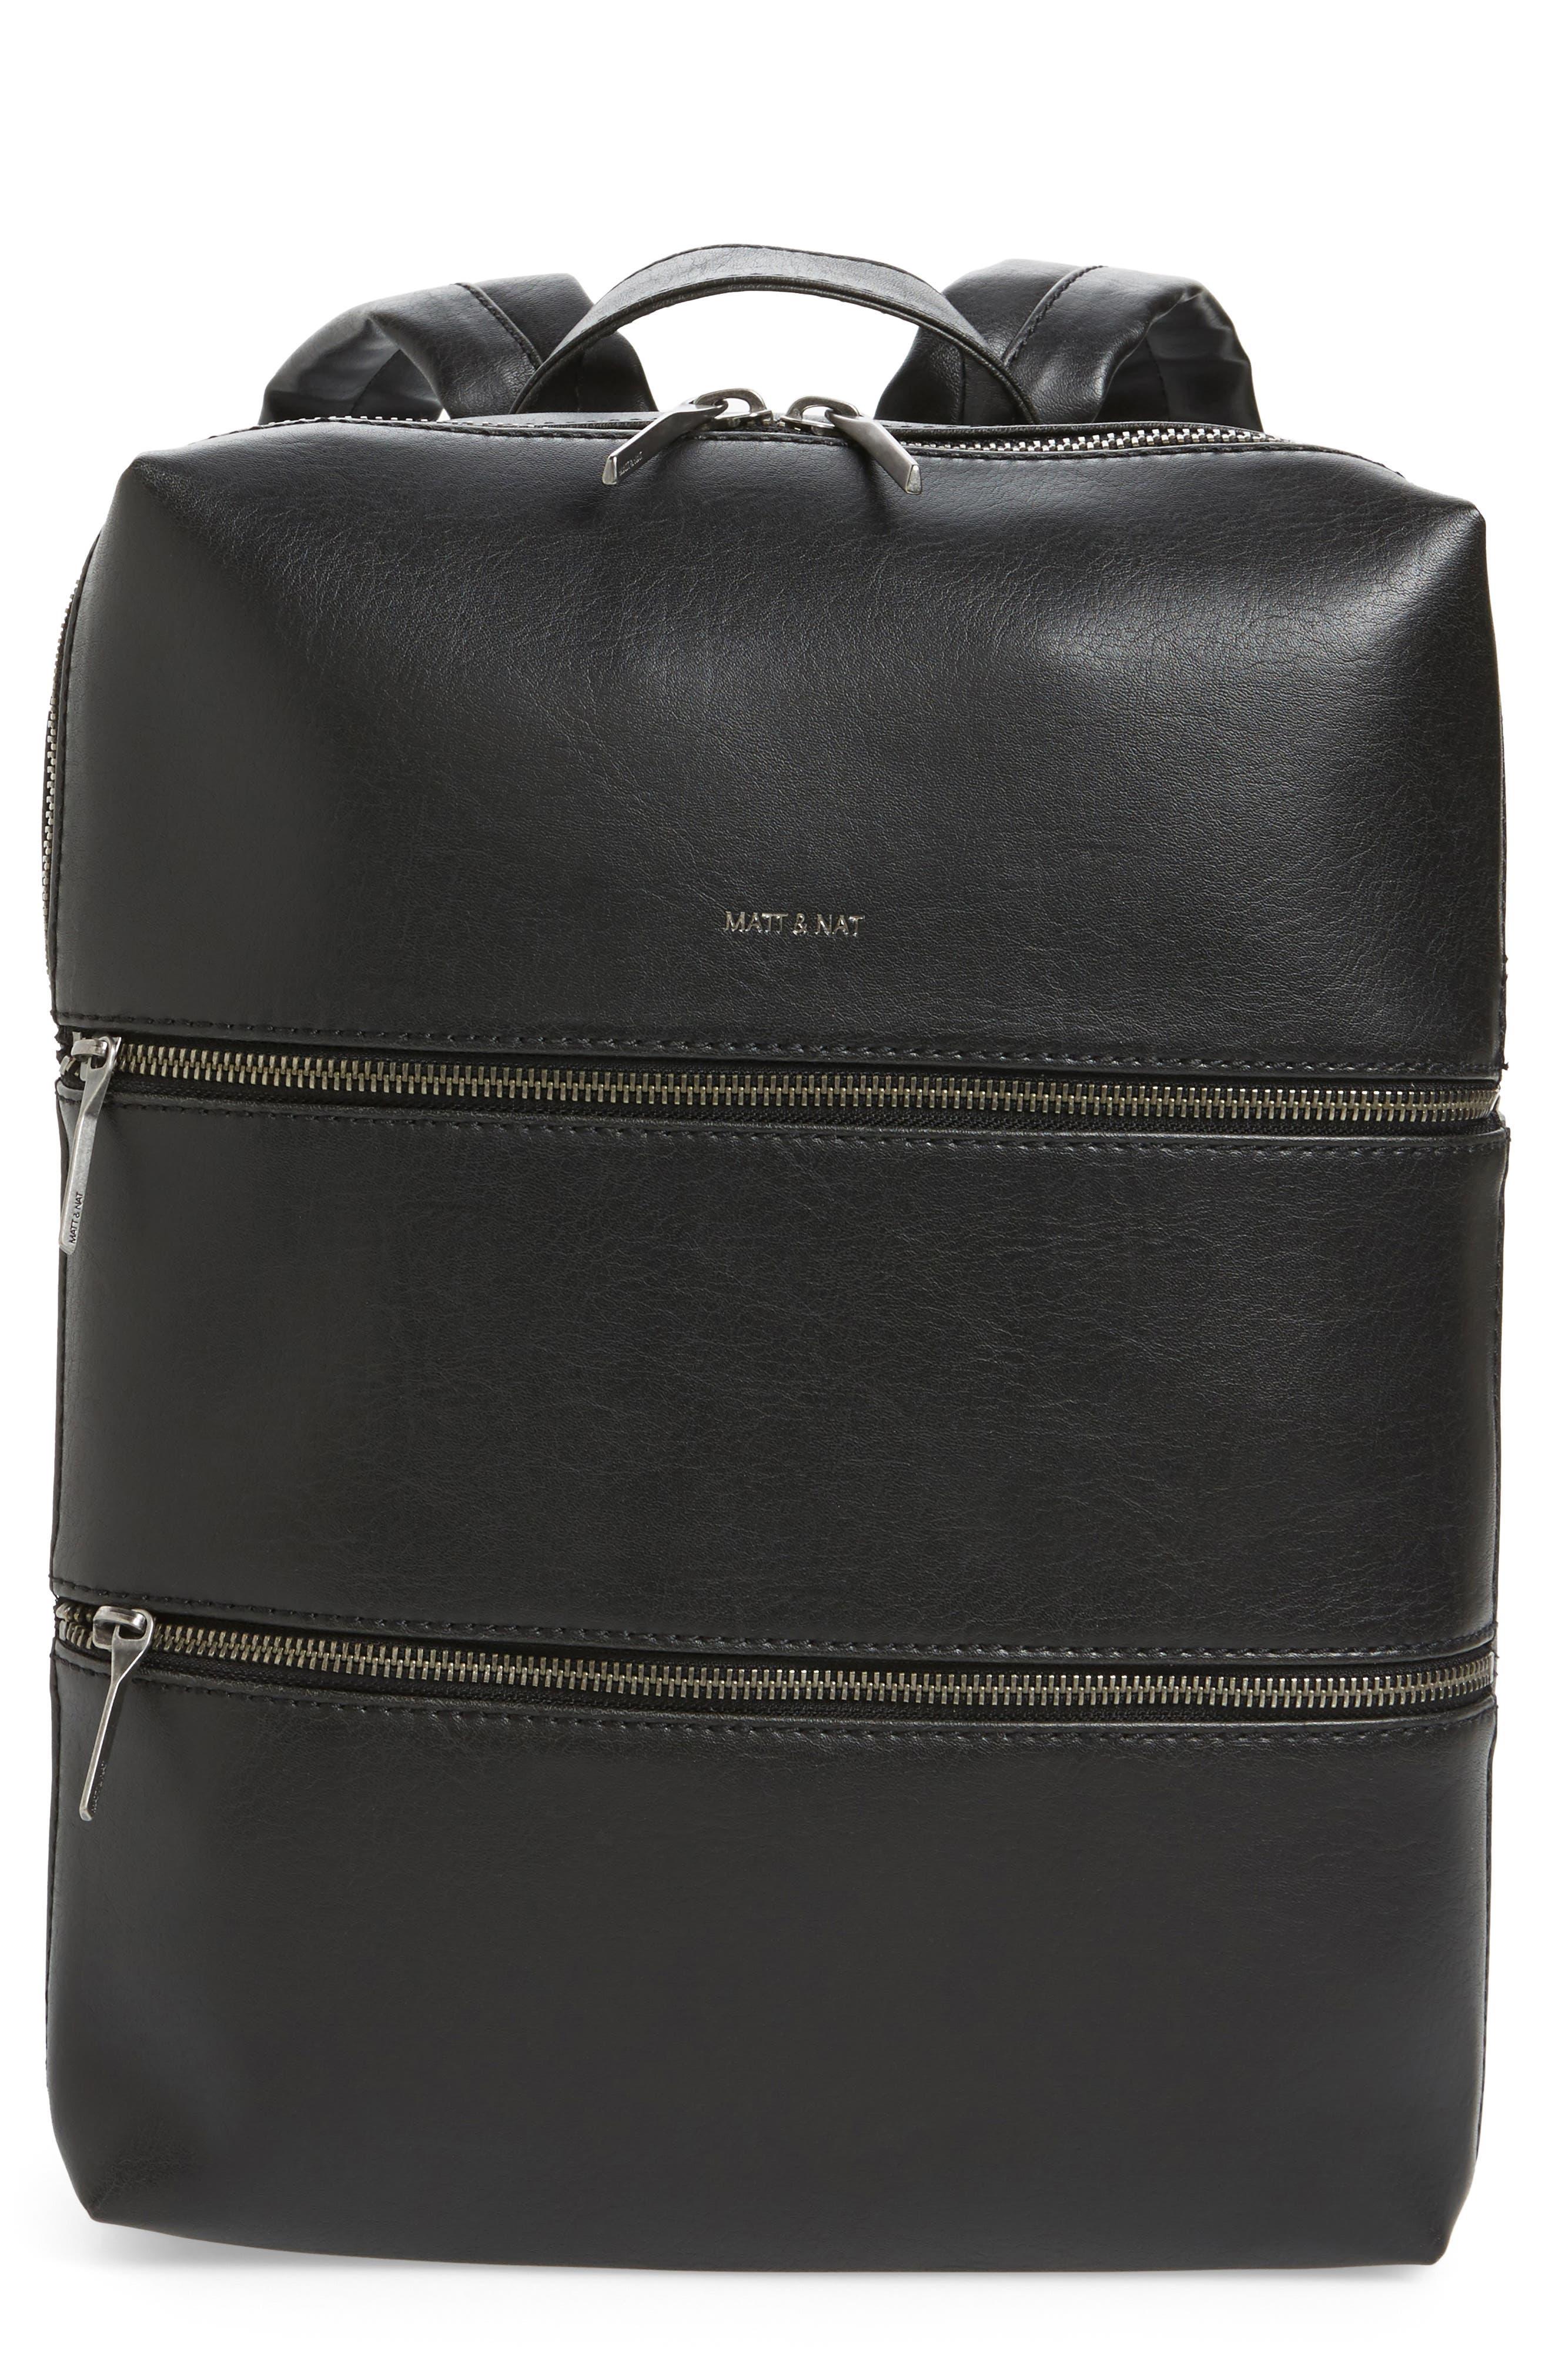 Alternate Image 1 Selected - Matt & Nat Slate Faux Leather Backpack